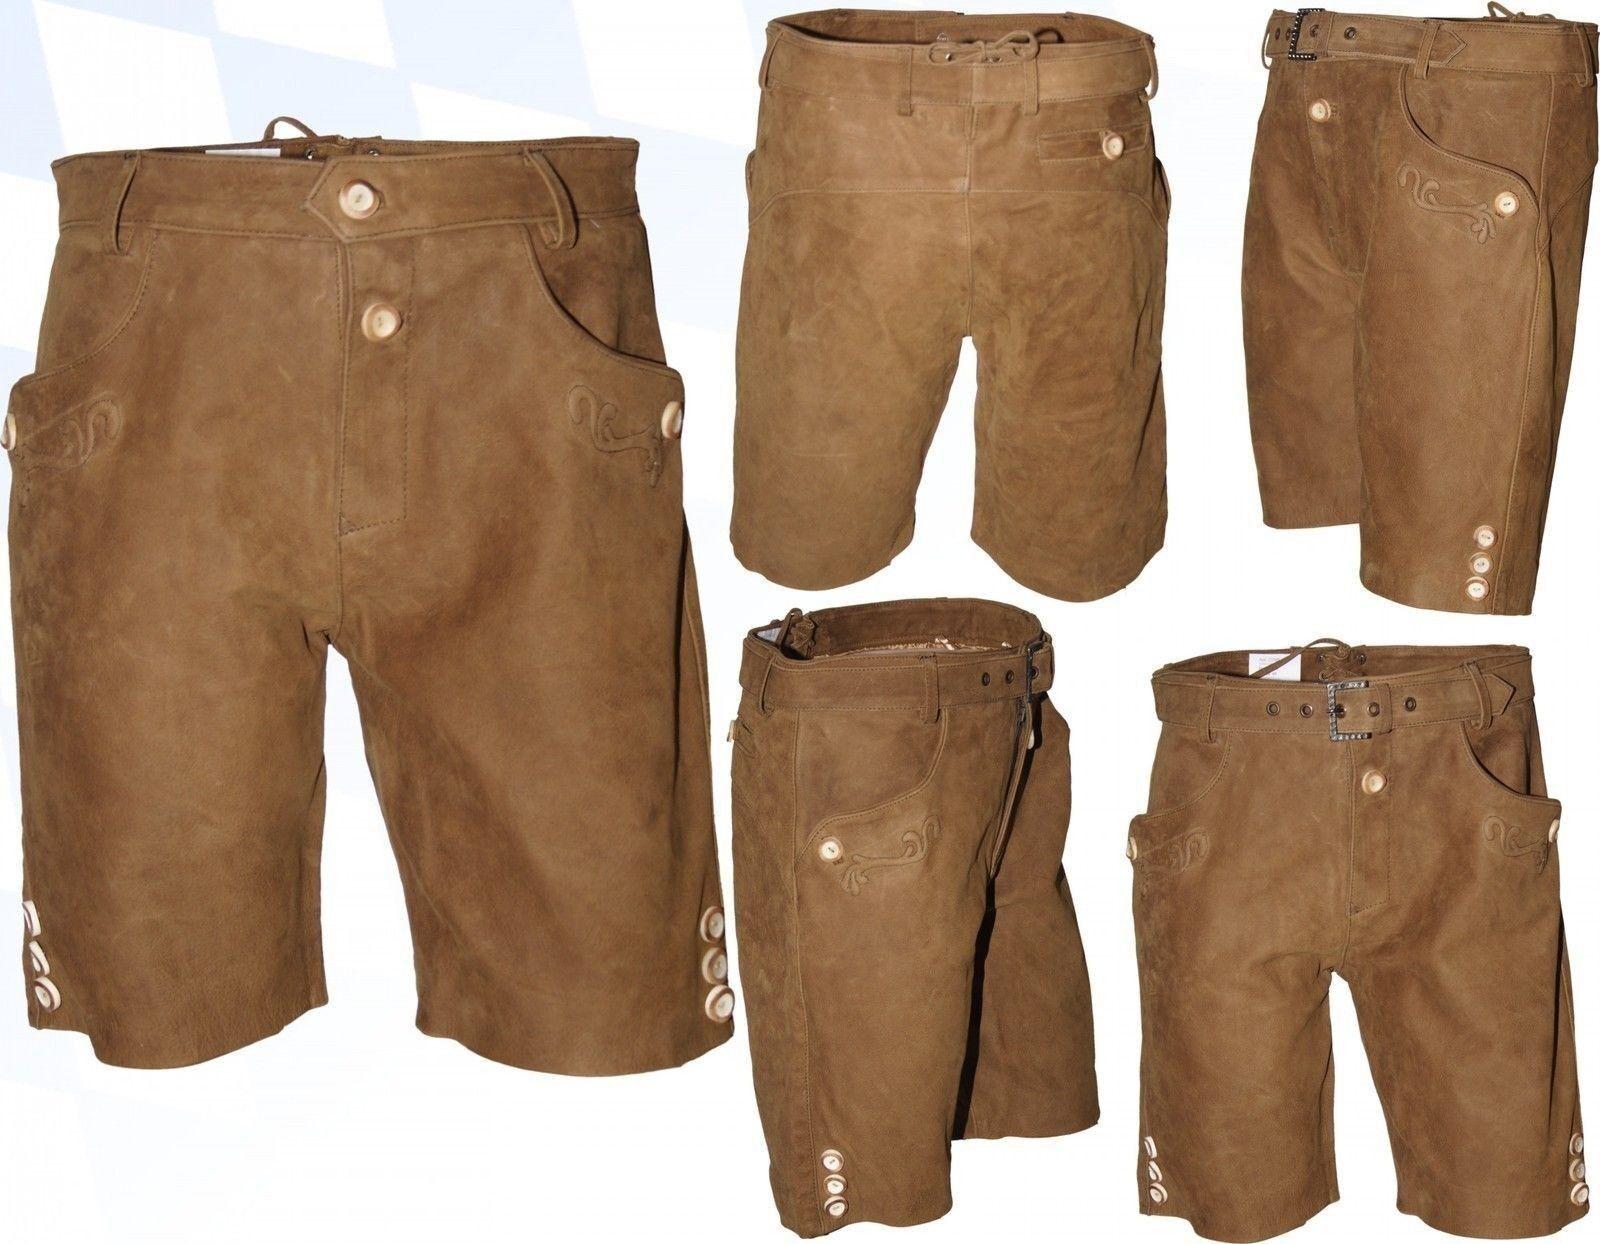 Breve Breve Breve deportiva Lederhose cuero Trachten pantalones bordado plattlerhose f982d8